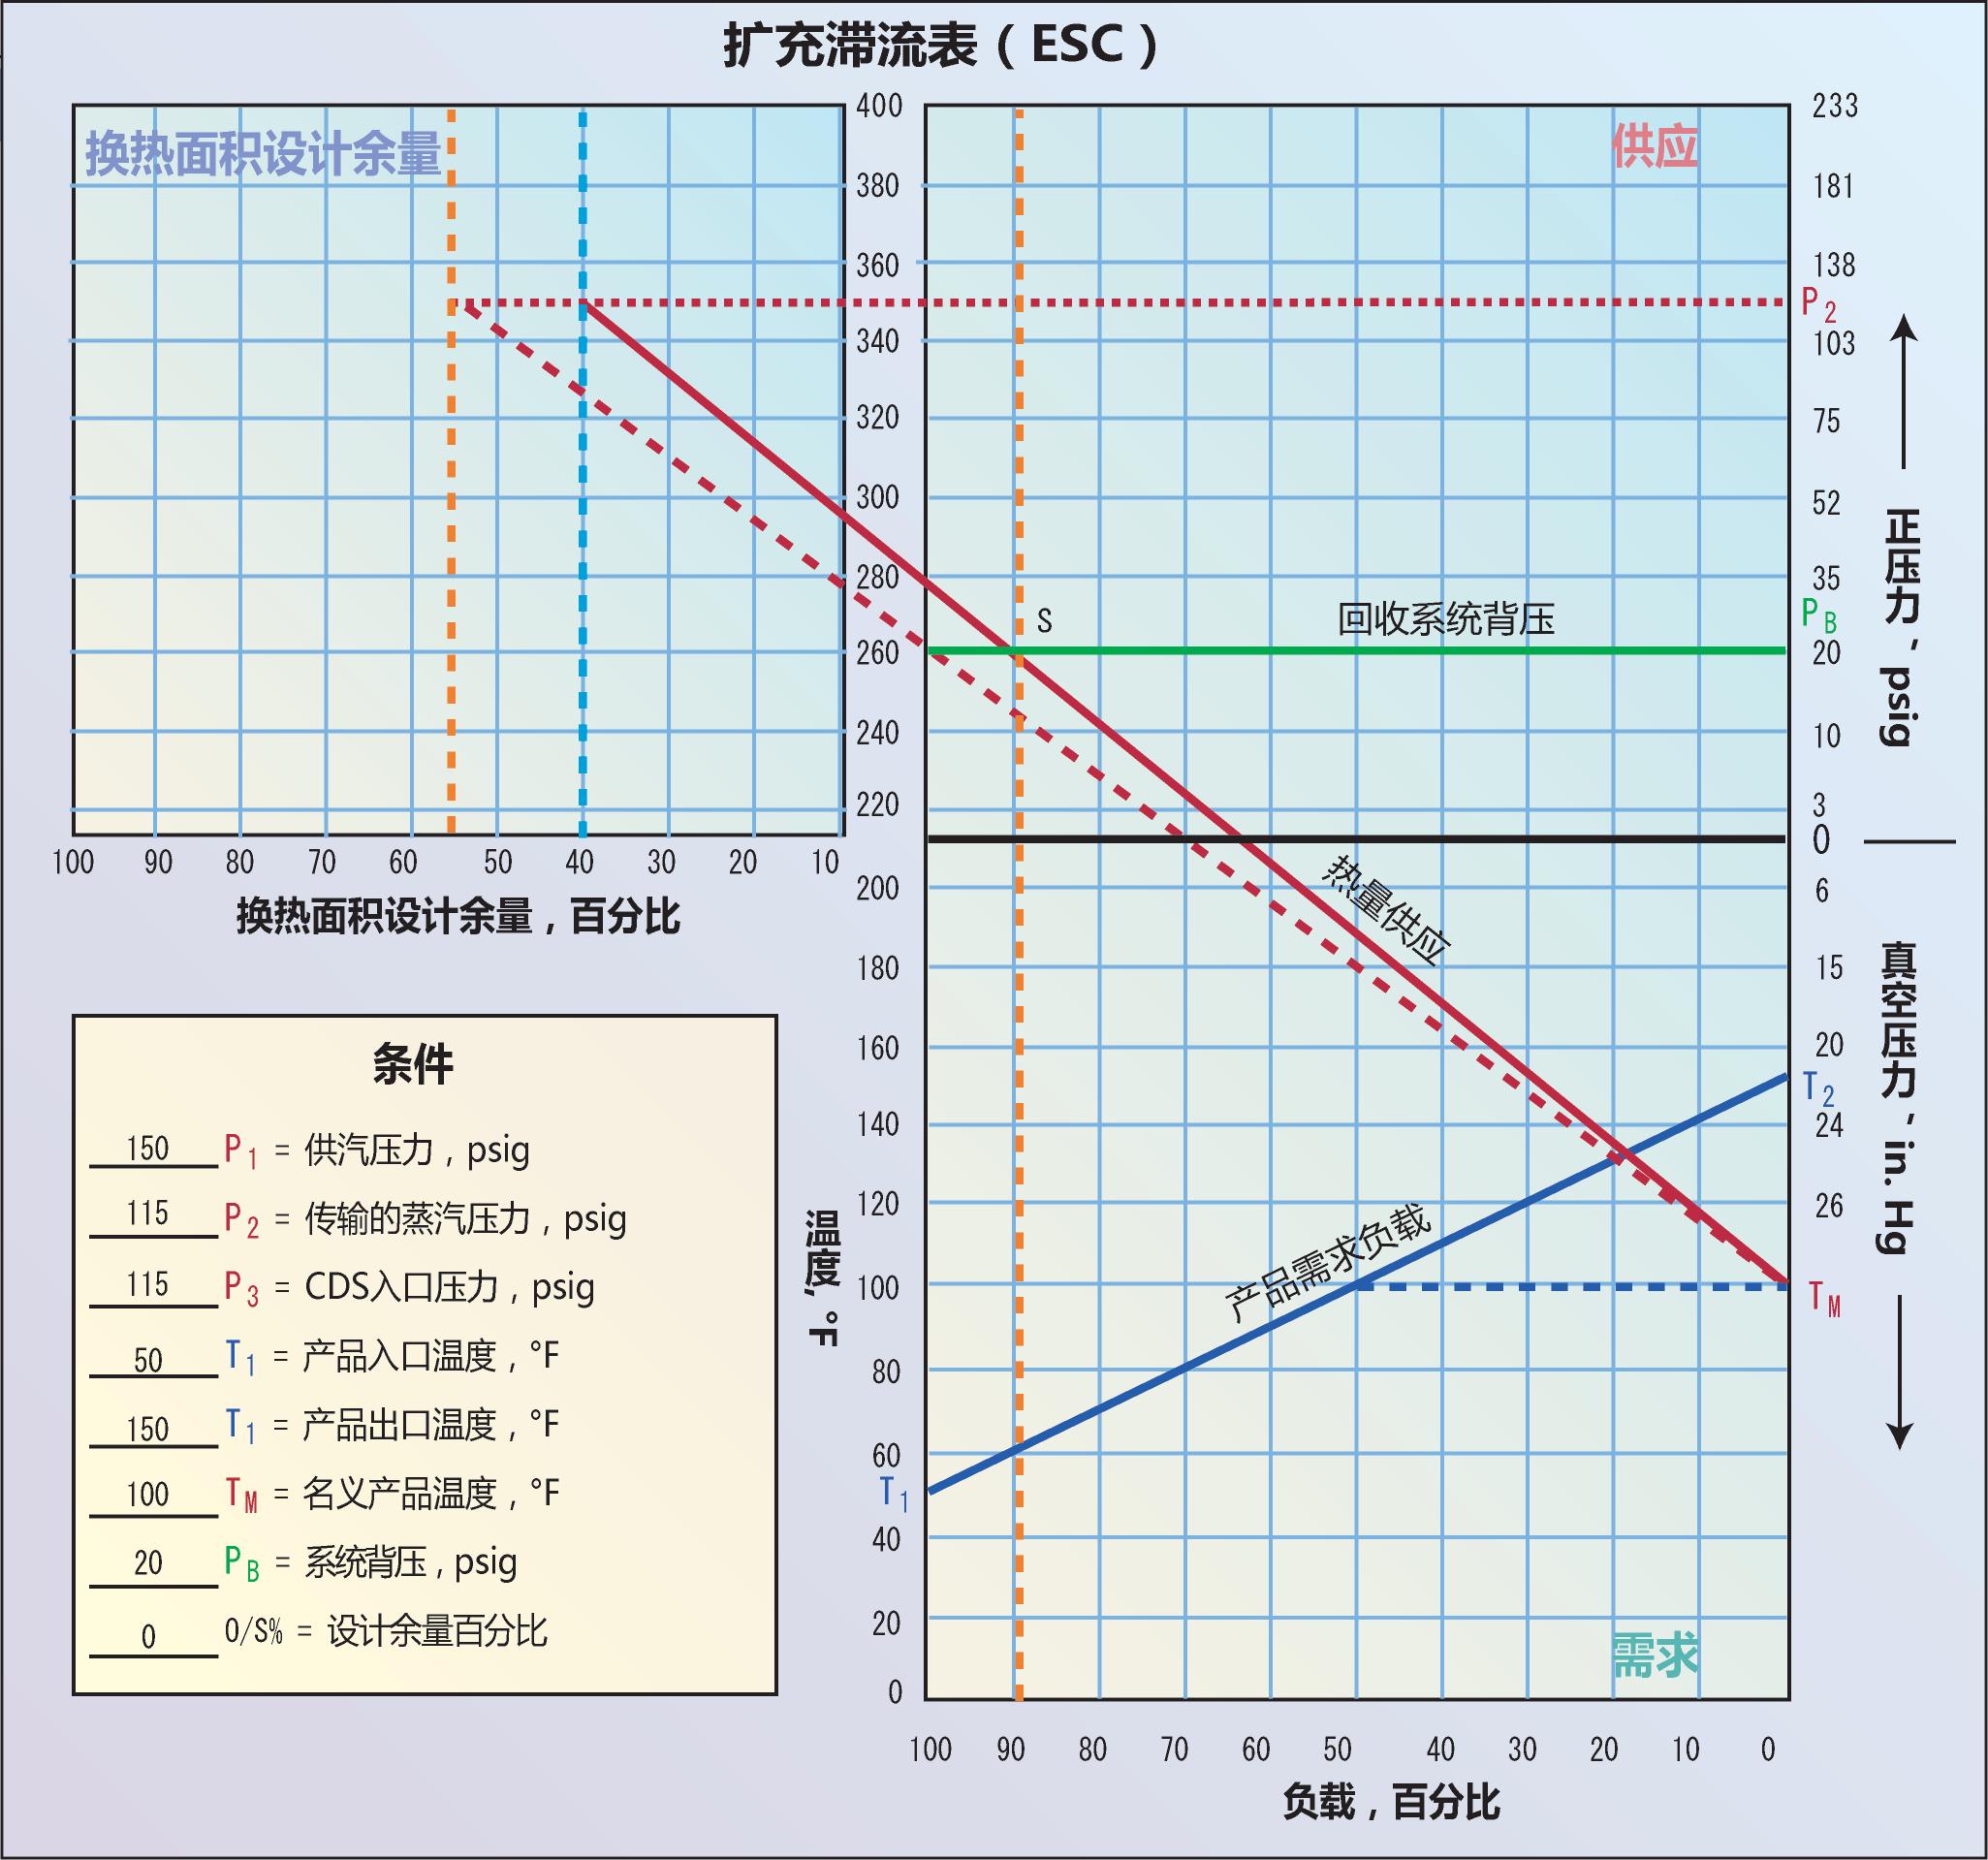 <strong>图5</strong> 当考虑换热面积设计余量时,能得出更准确的滞流点,图示滞流点为90%的满负载工况